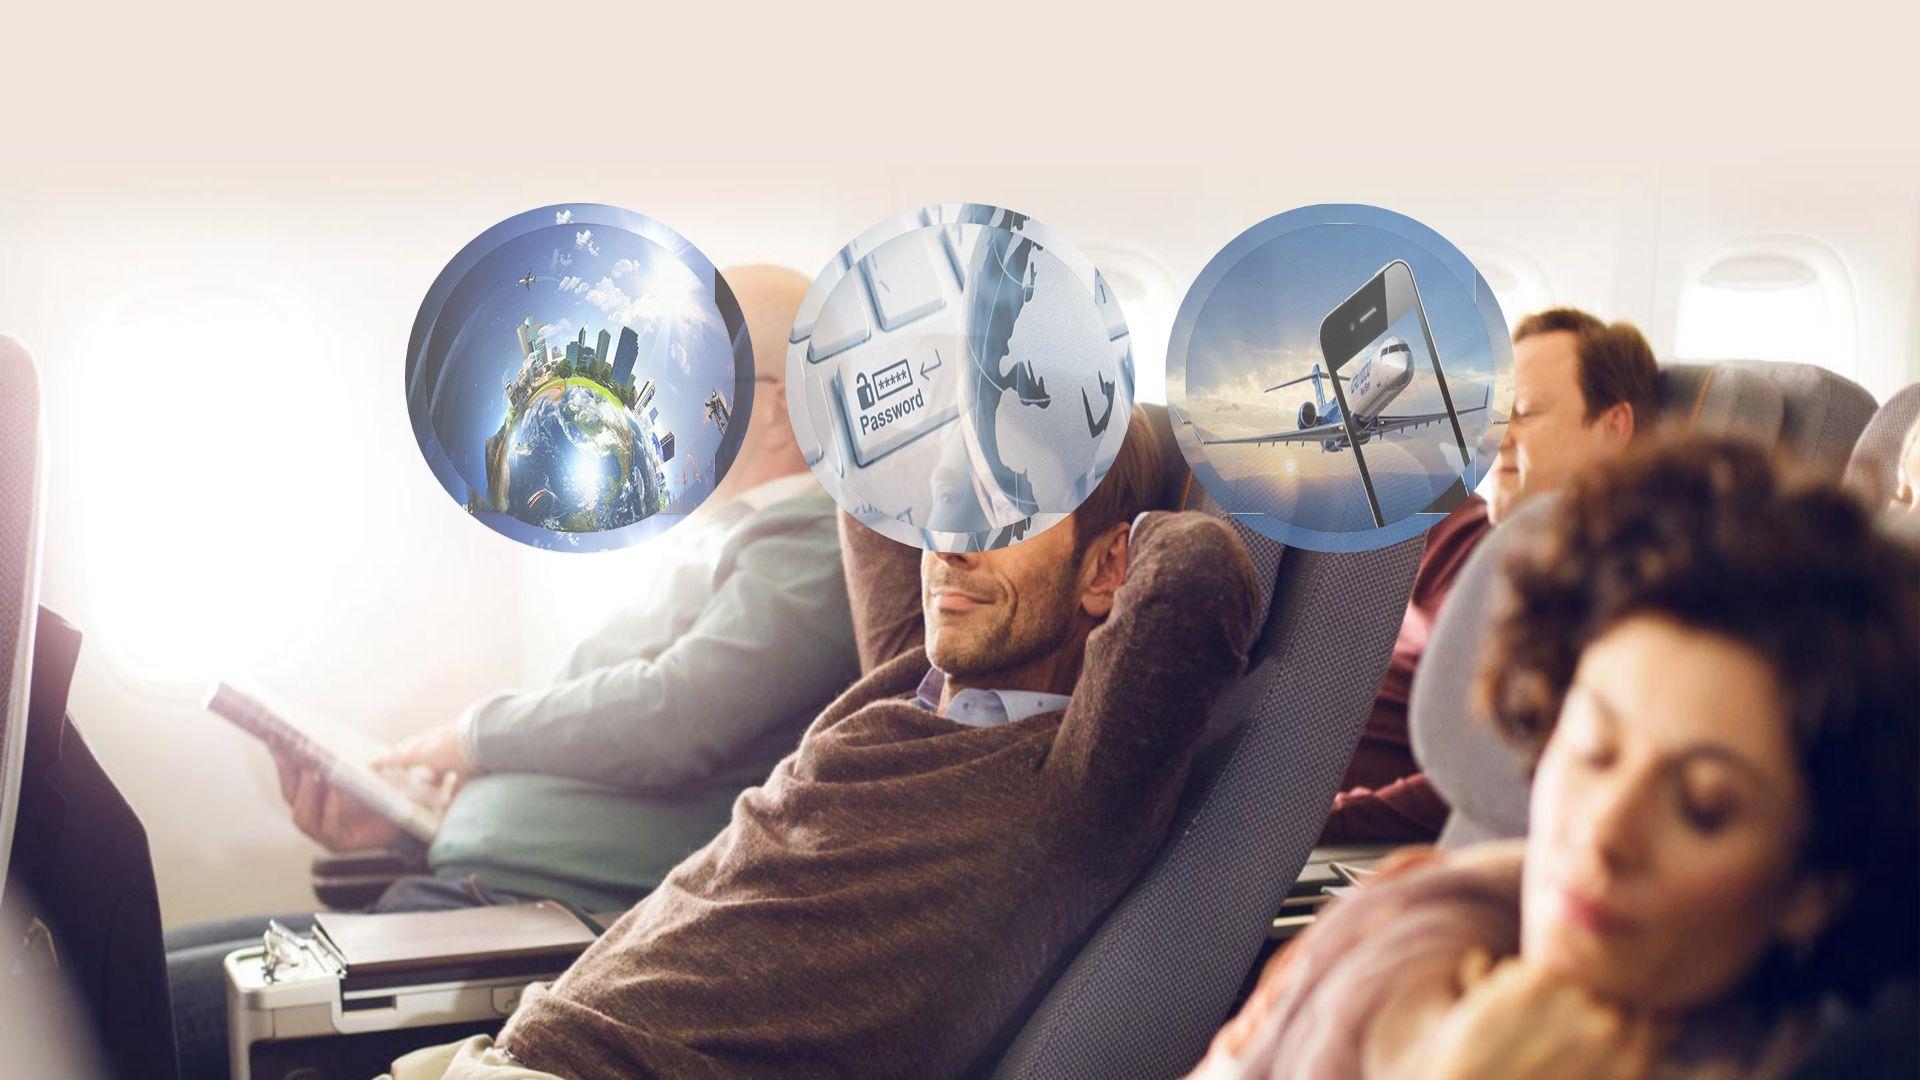 طراحی سايت آژانس مسافرتی پر پرواز توس